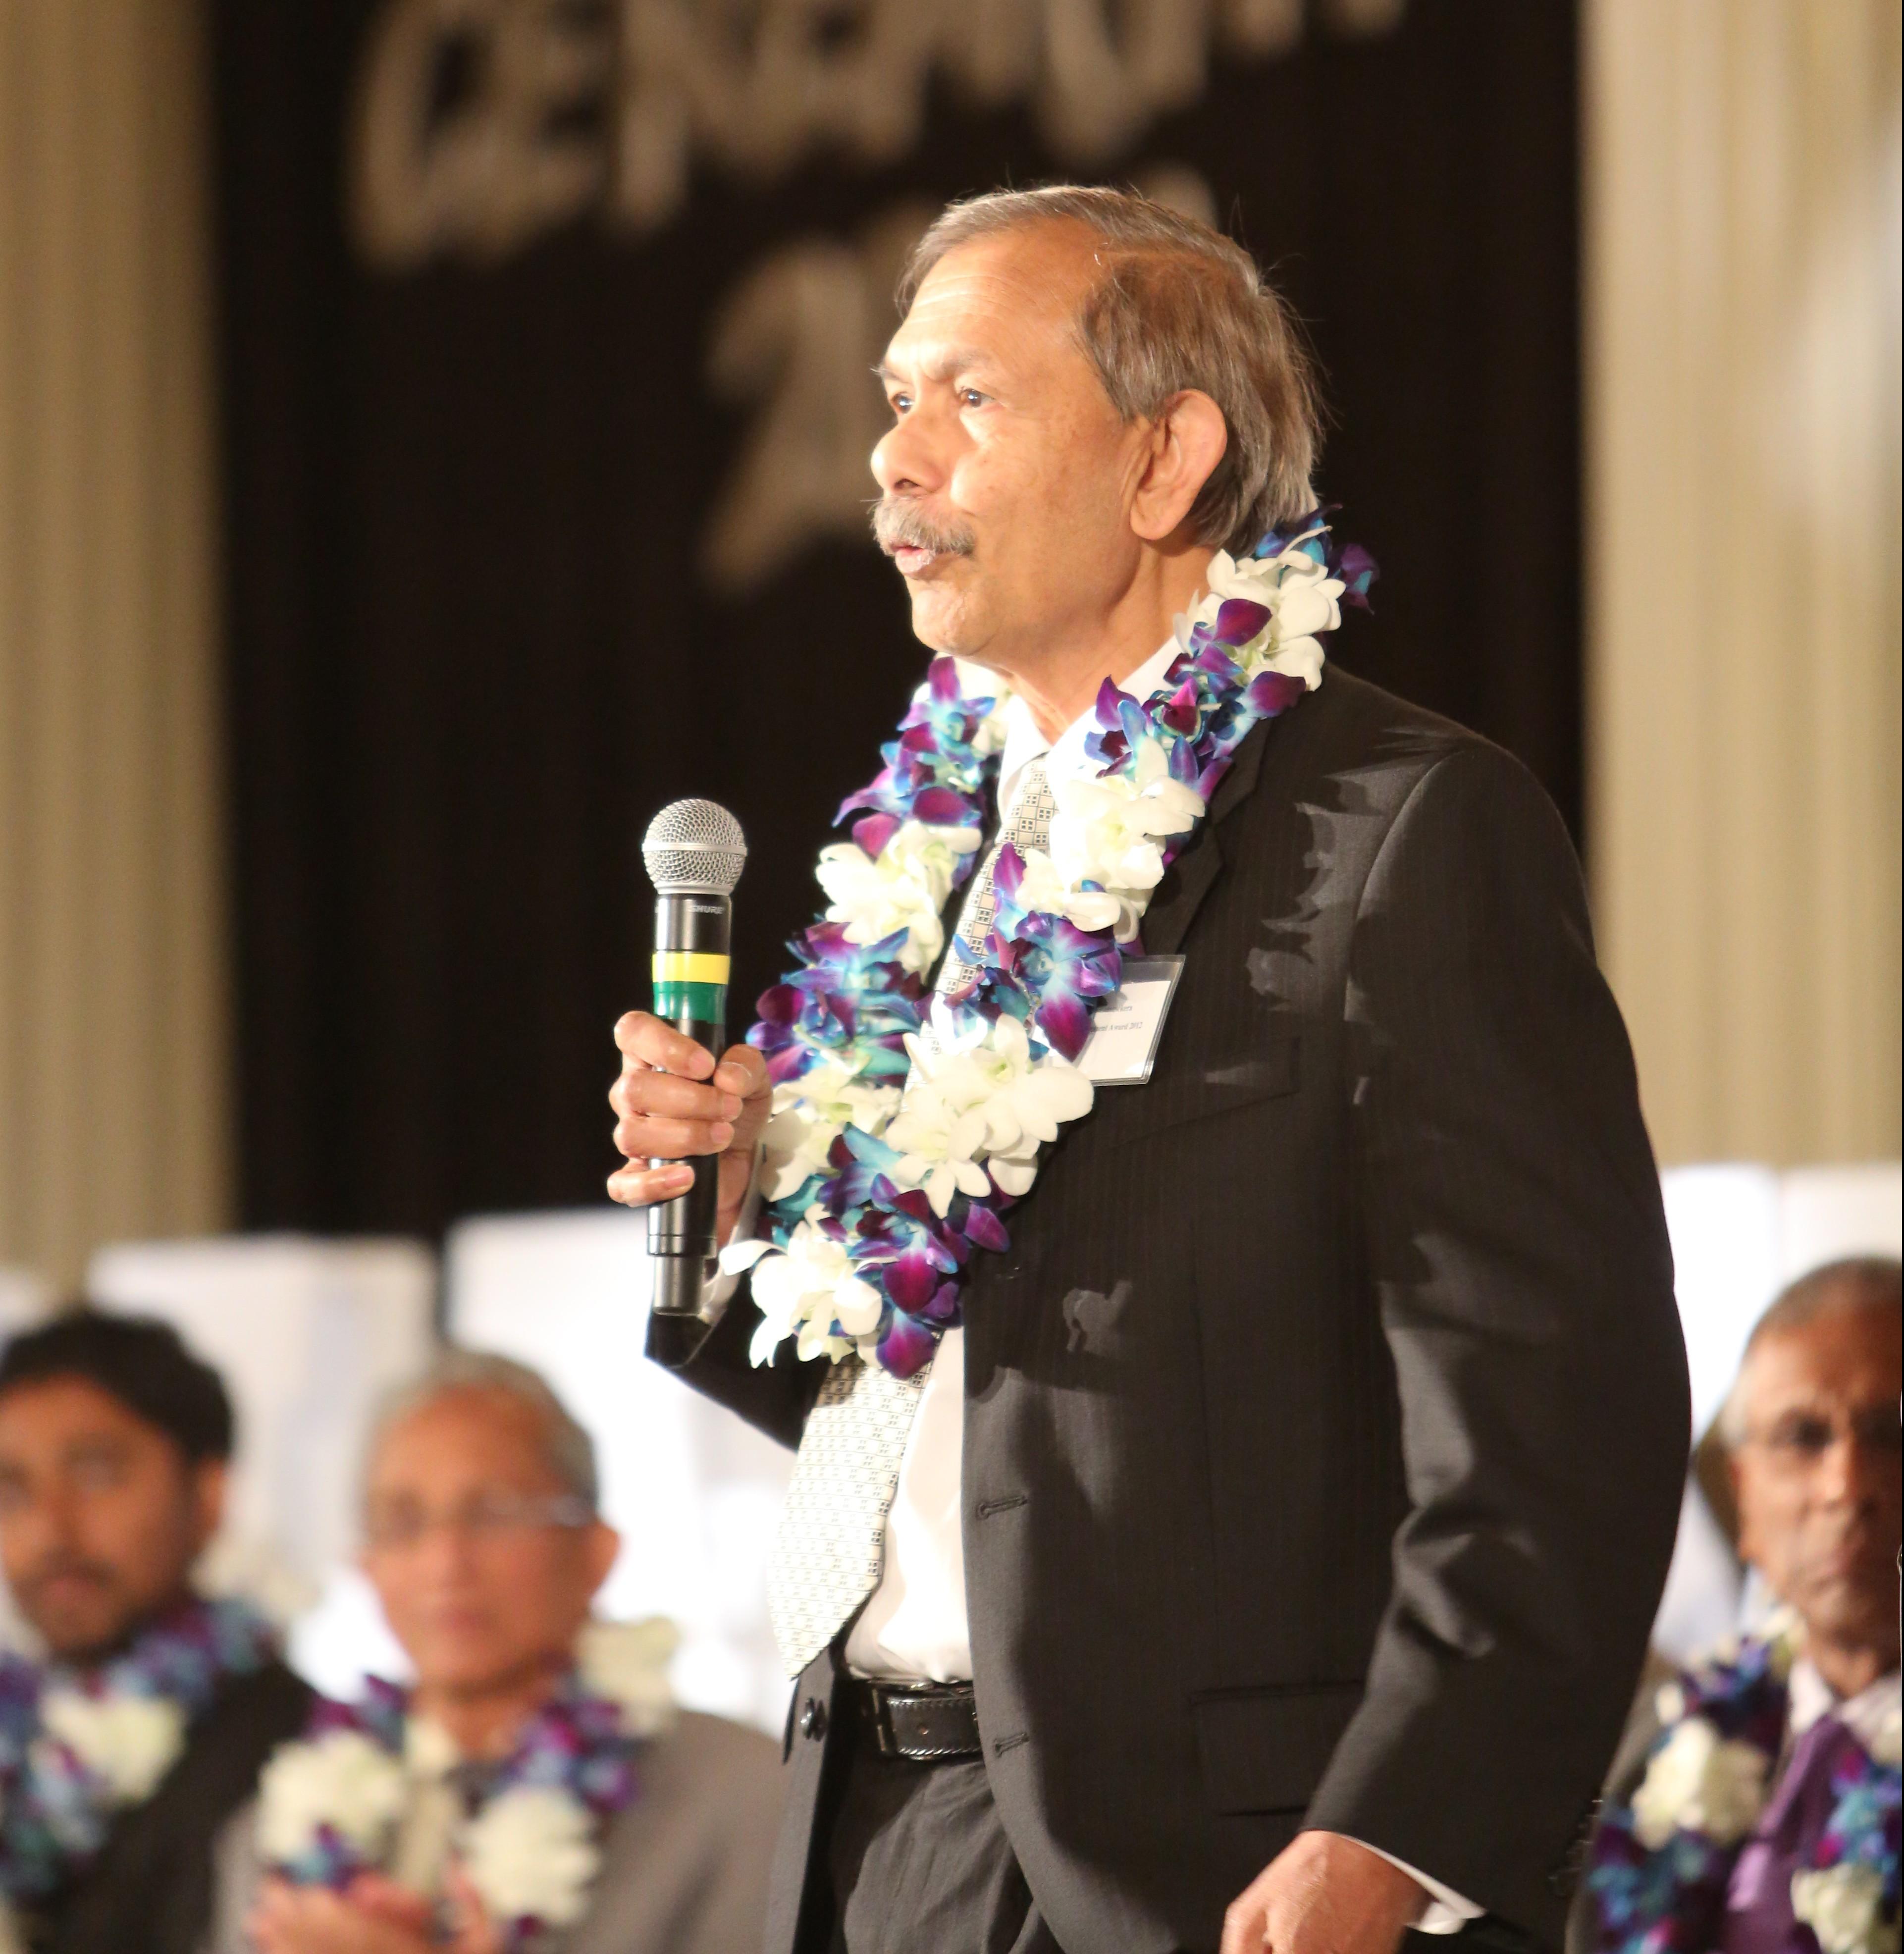 Prof. Jay S. Gunasekara